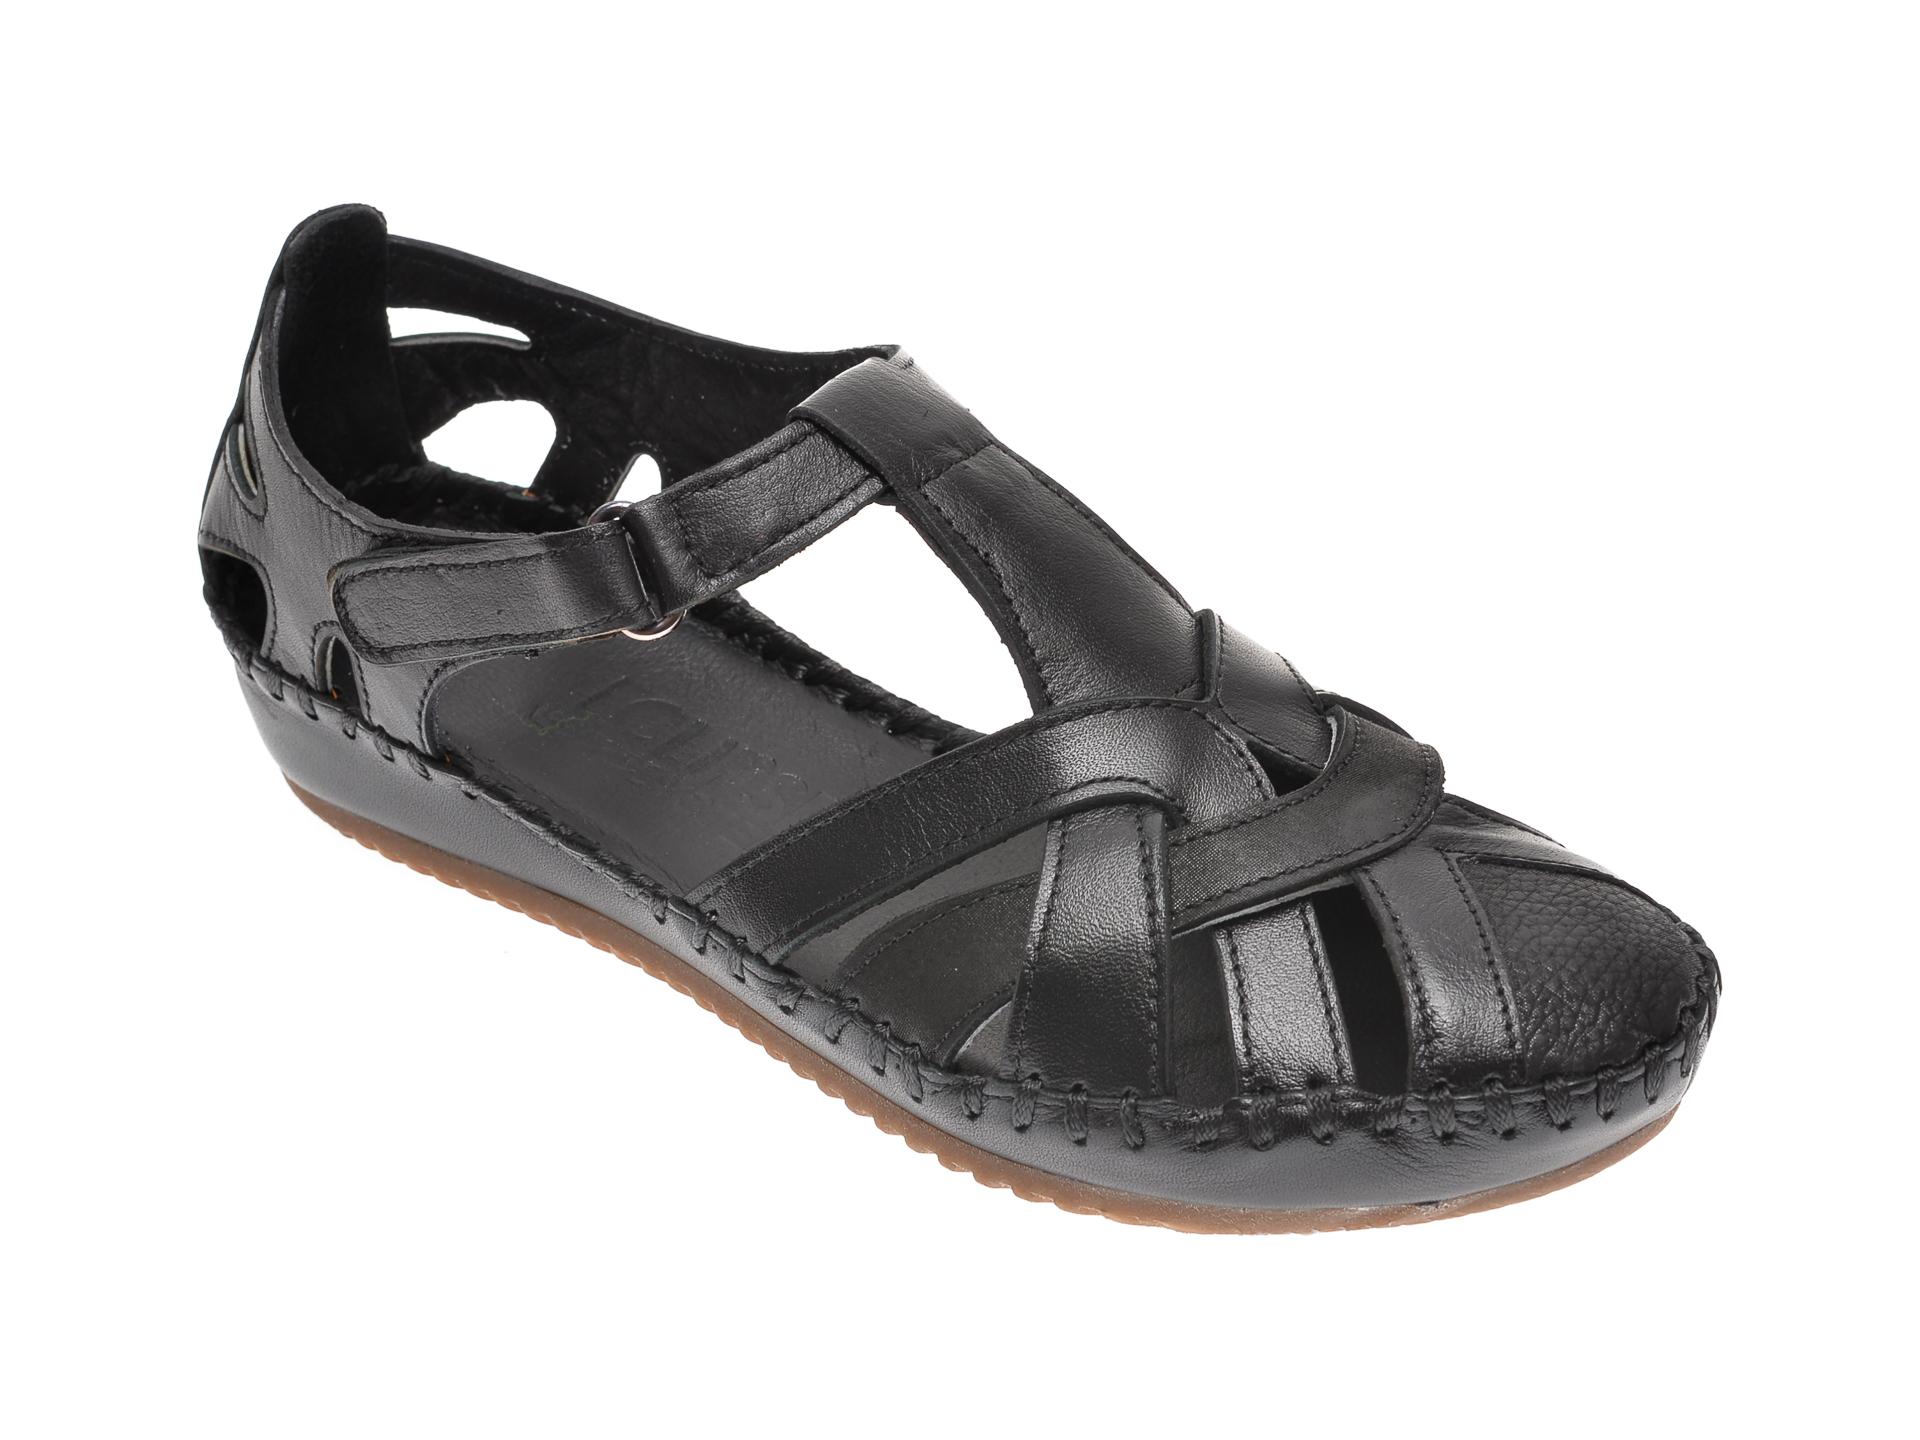 Sandale ECLIPSE negre, 705, din piele naturala